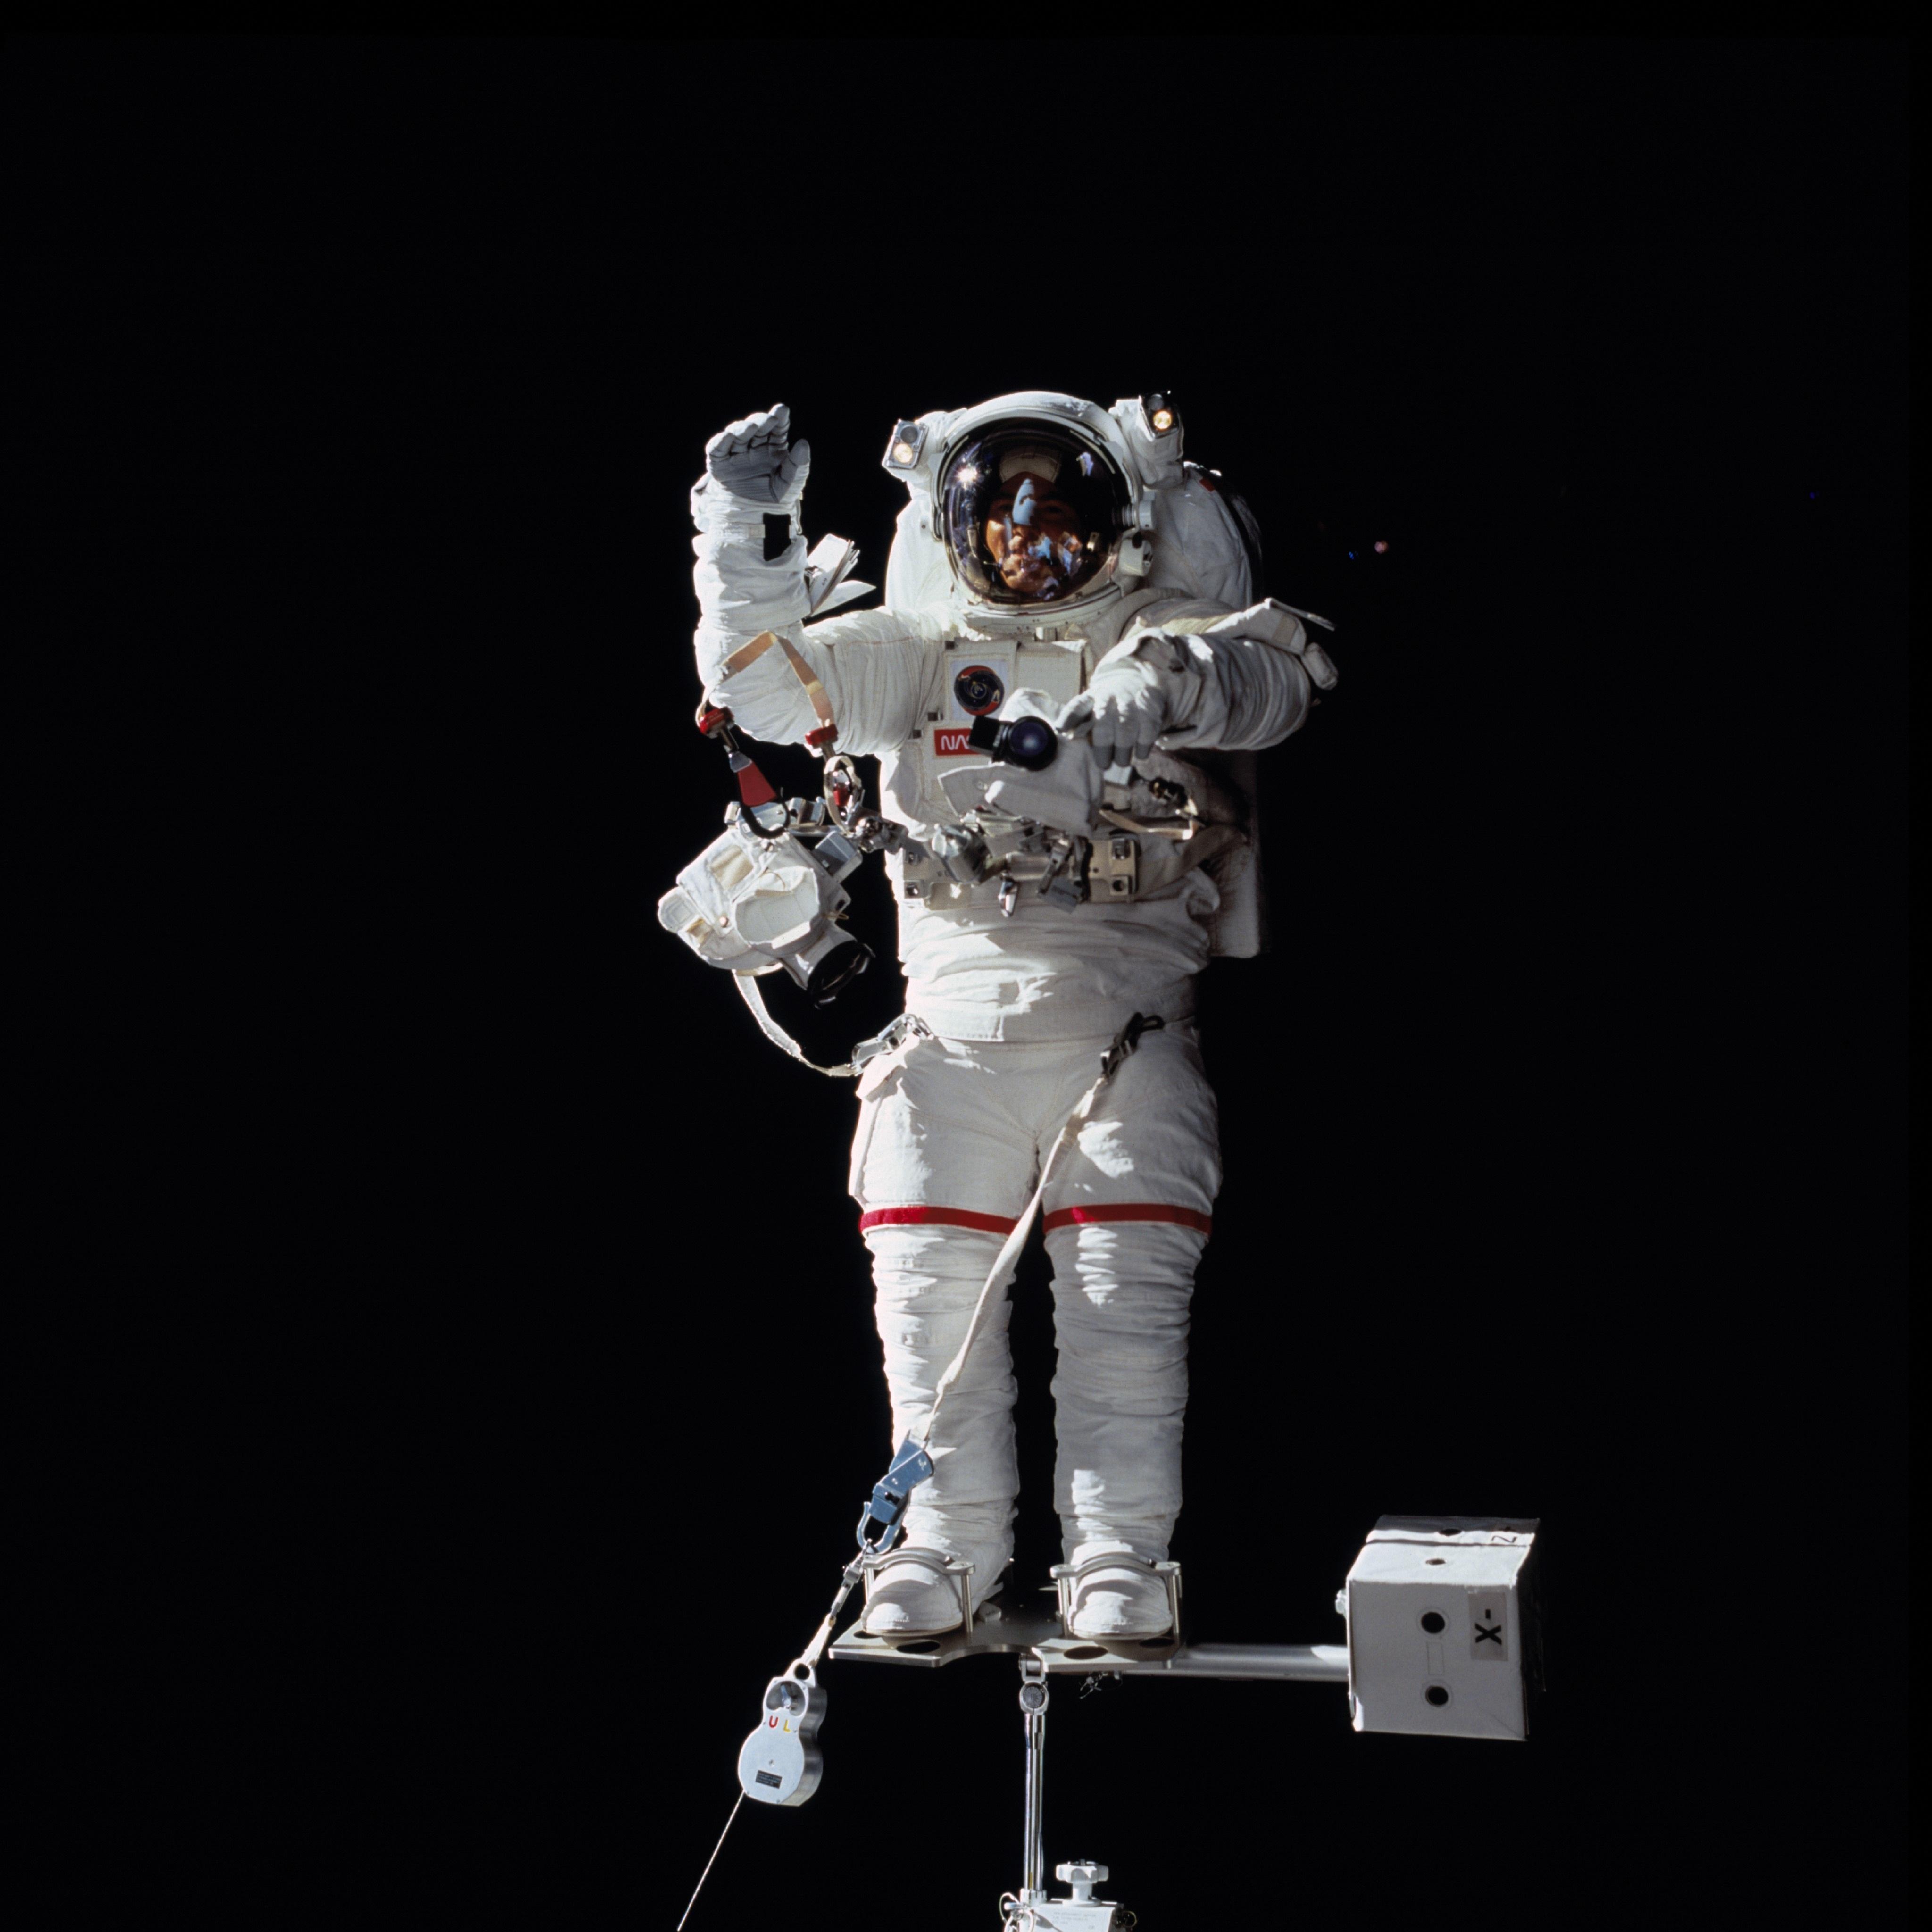 astronaut in suit - HD4096×4096